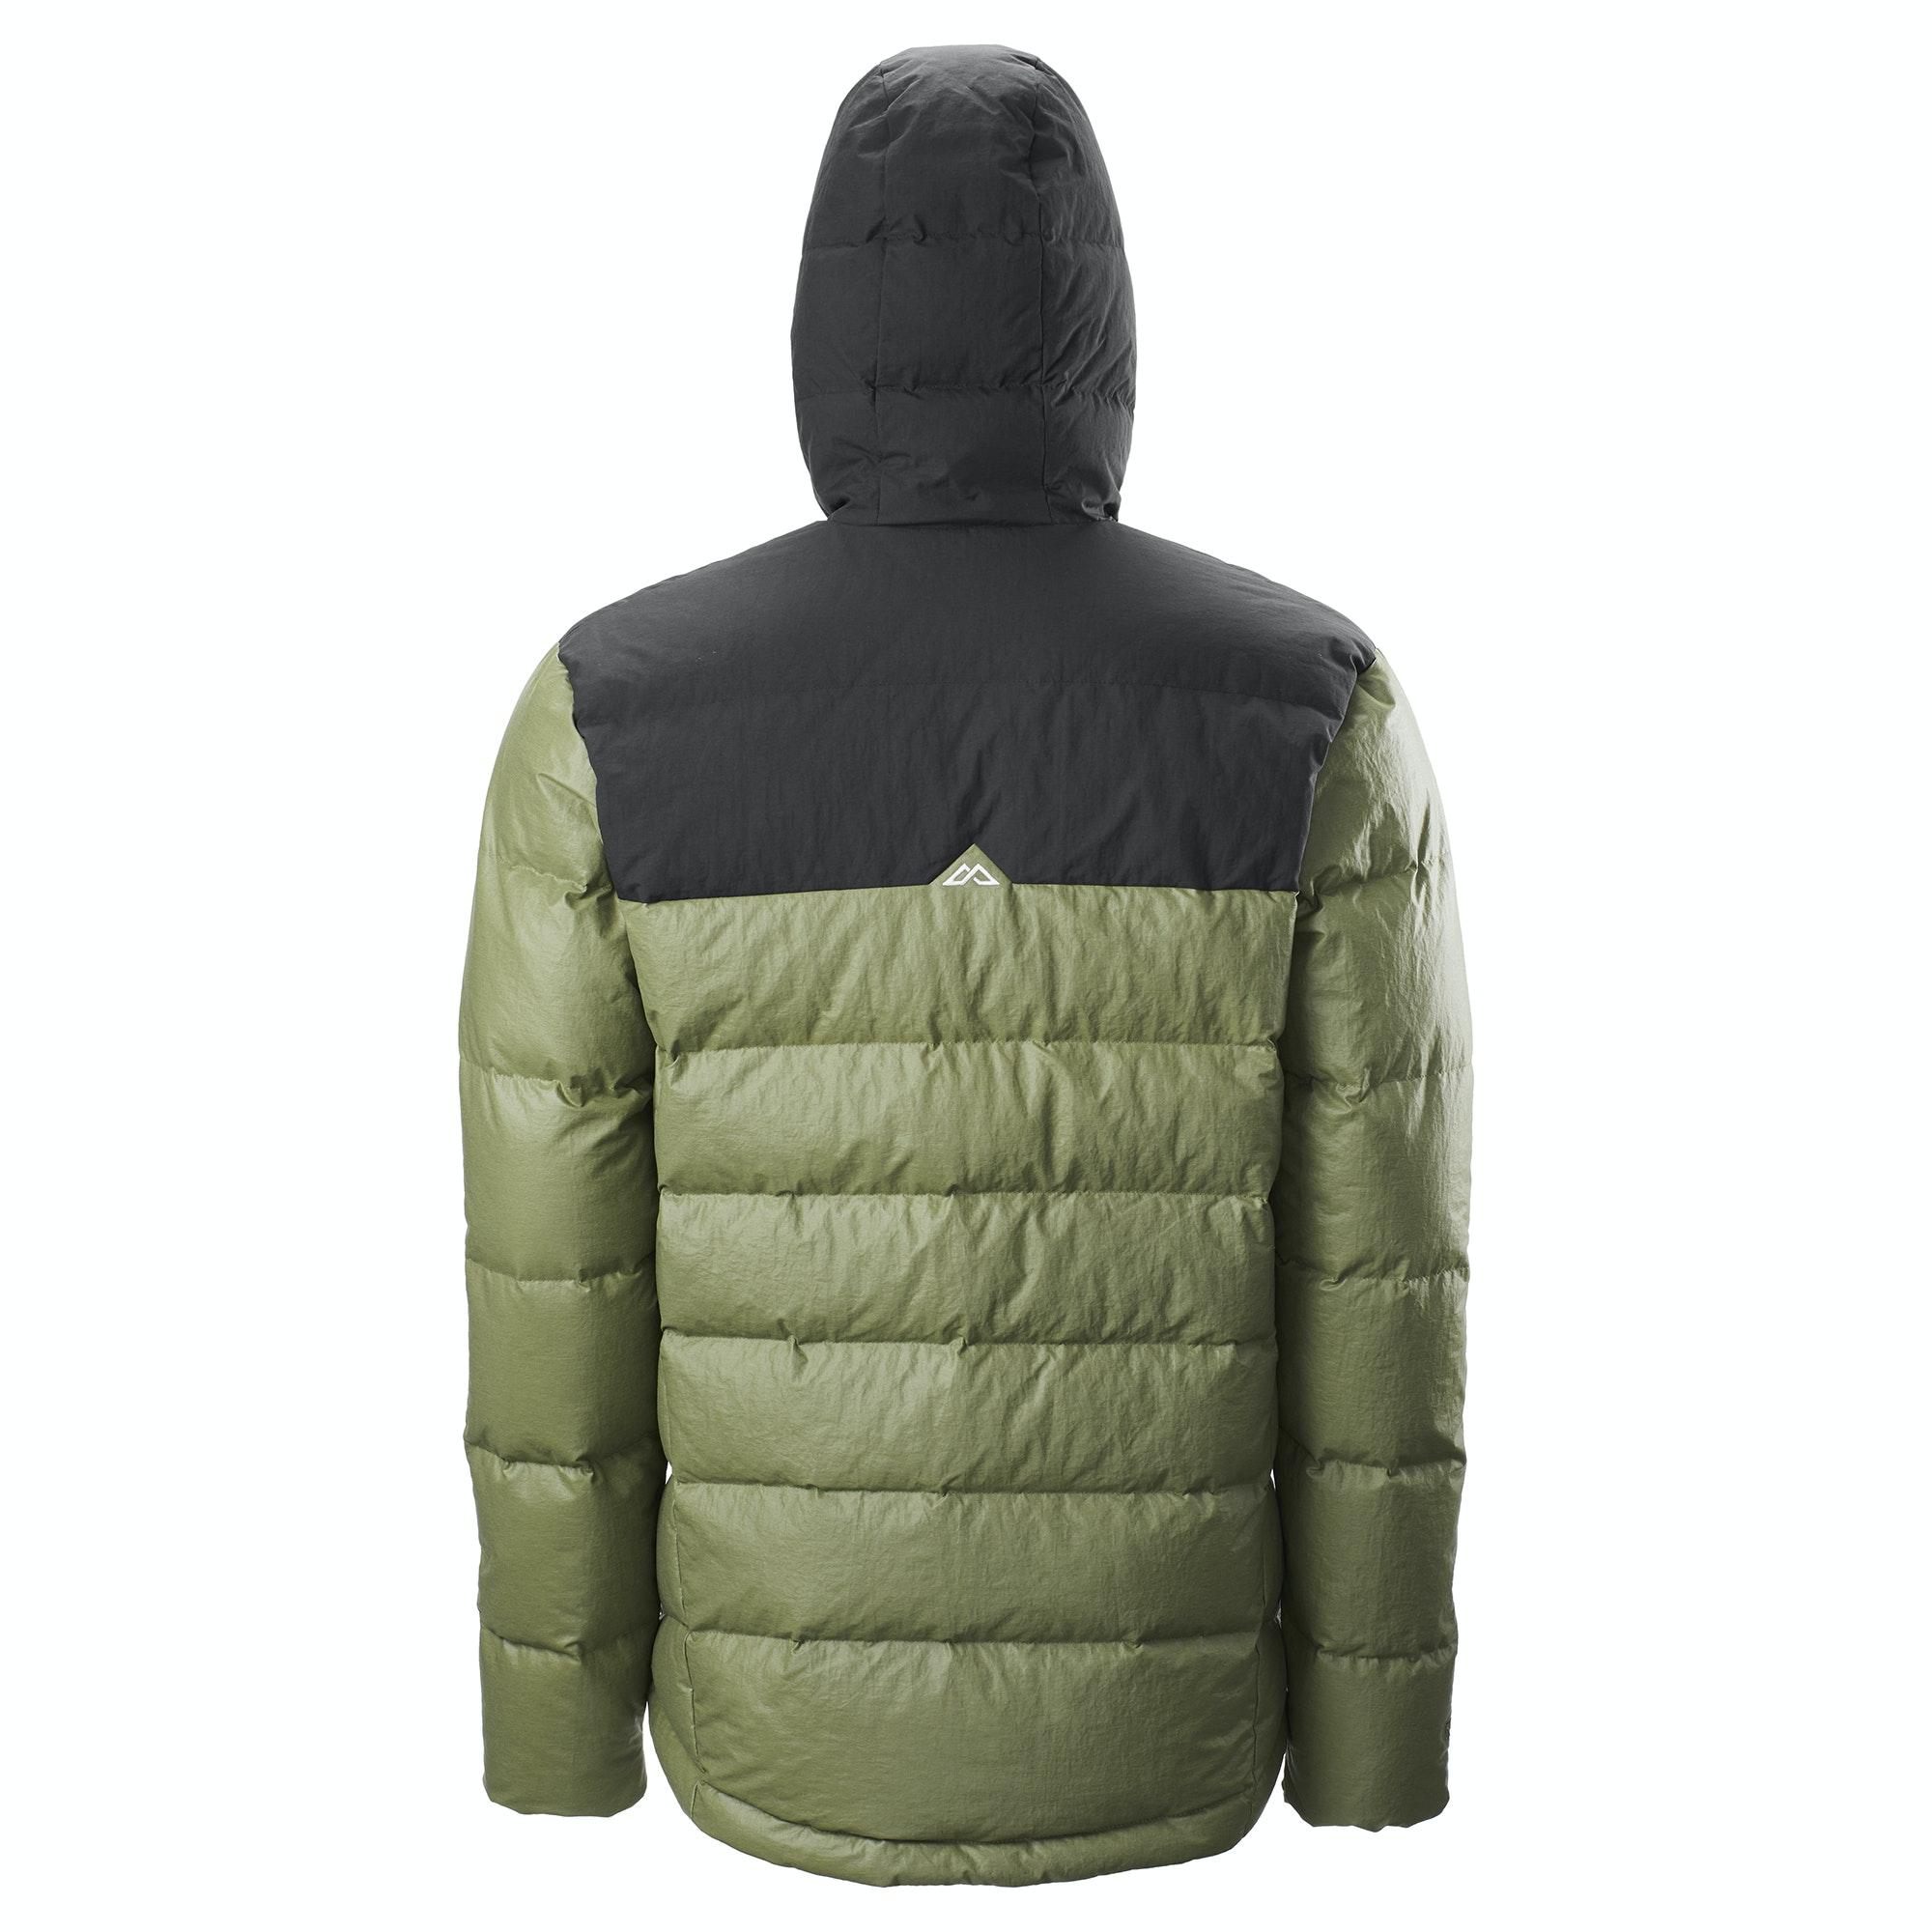 NEW-Kathmandu-Epiq-Men-039-s-Hooded-Warm-Winter-Duck-Down-Puffer-Jacket-v2 thumbnail 22